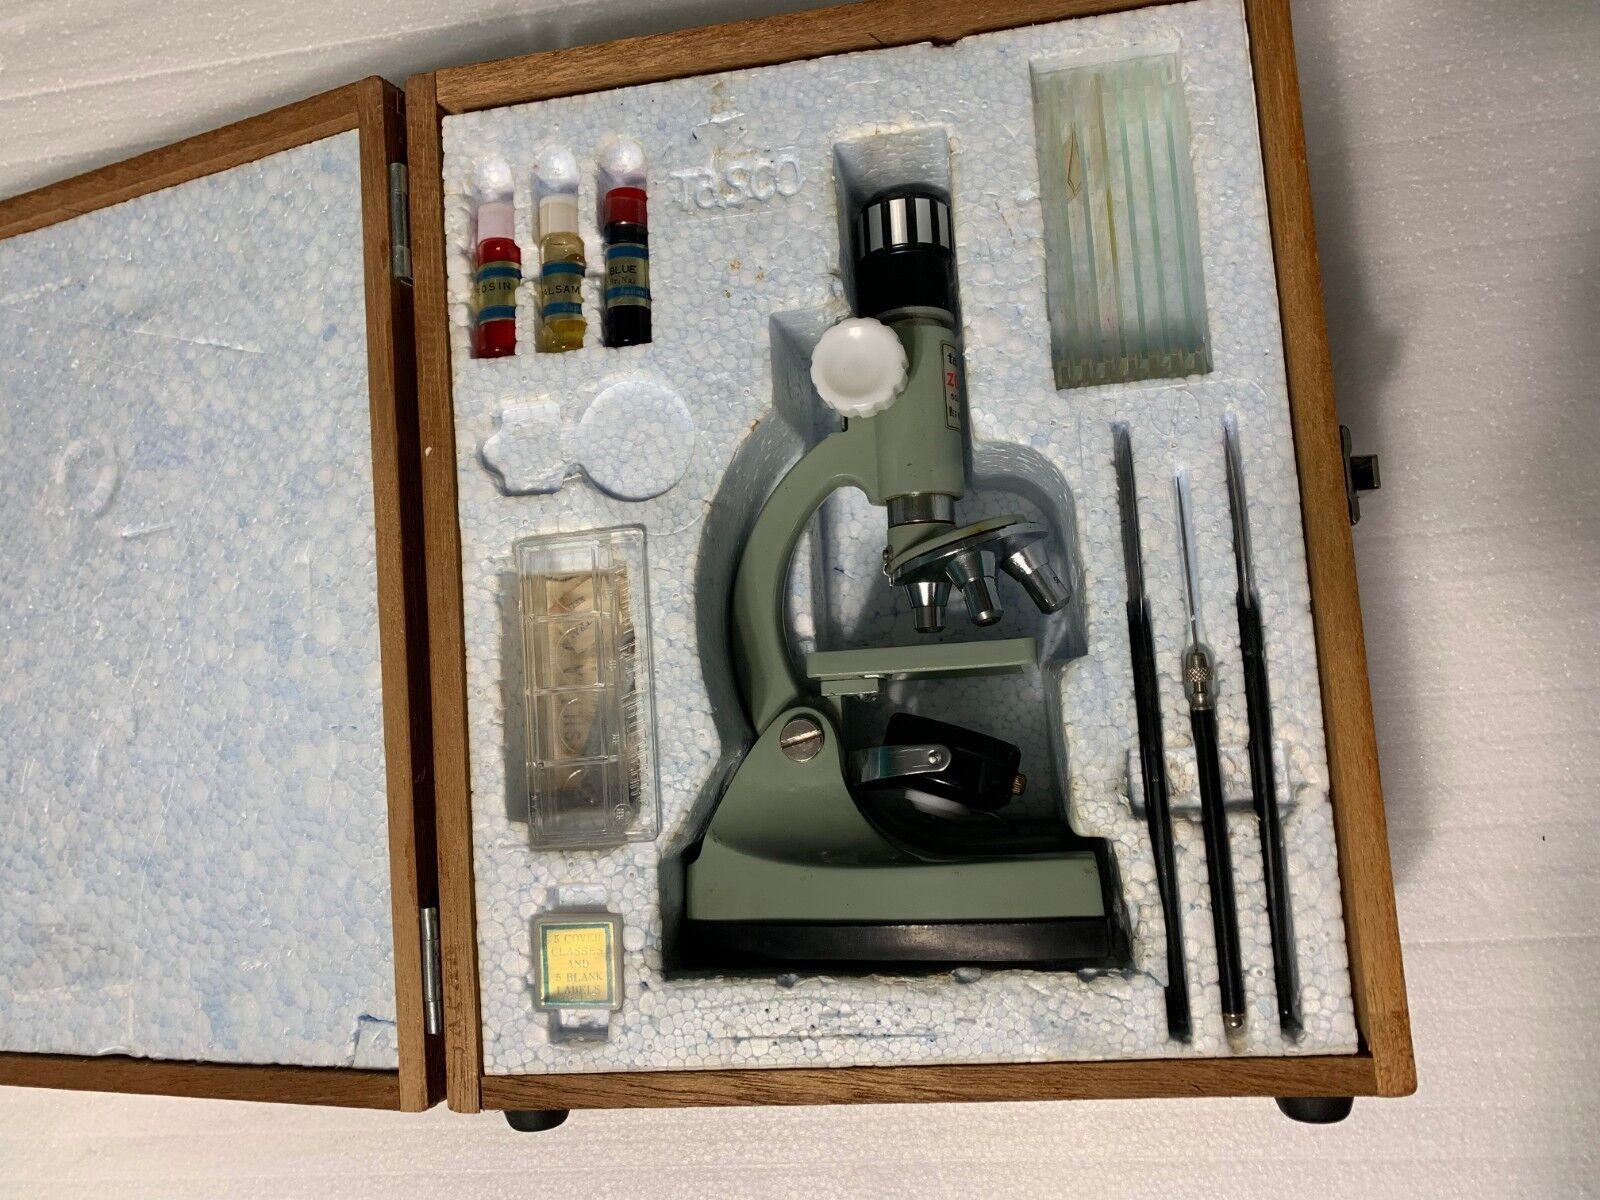 Vintage Tasco Deluxe Microscope Set in Wooden Case